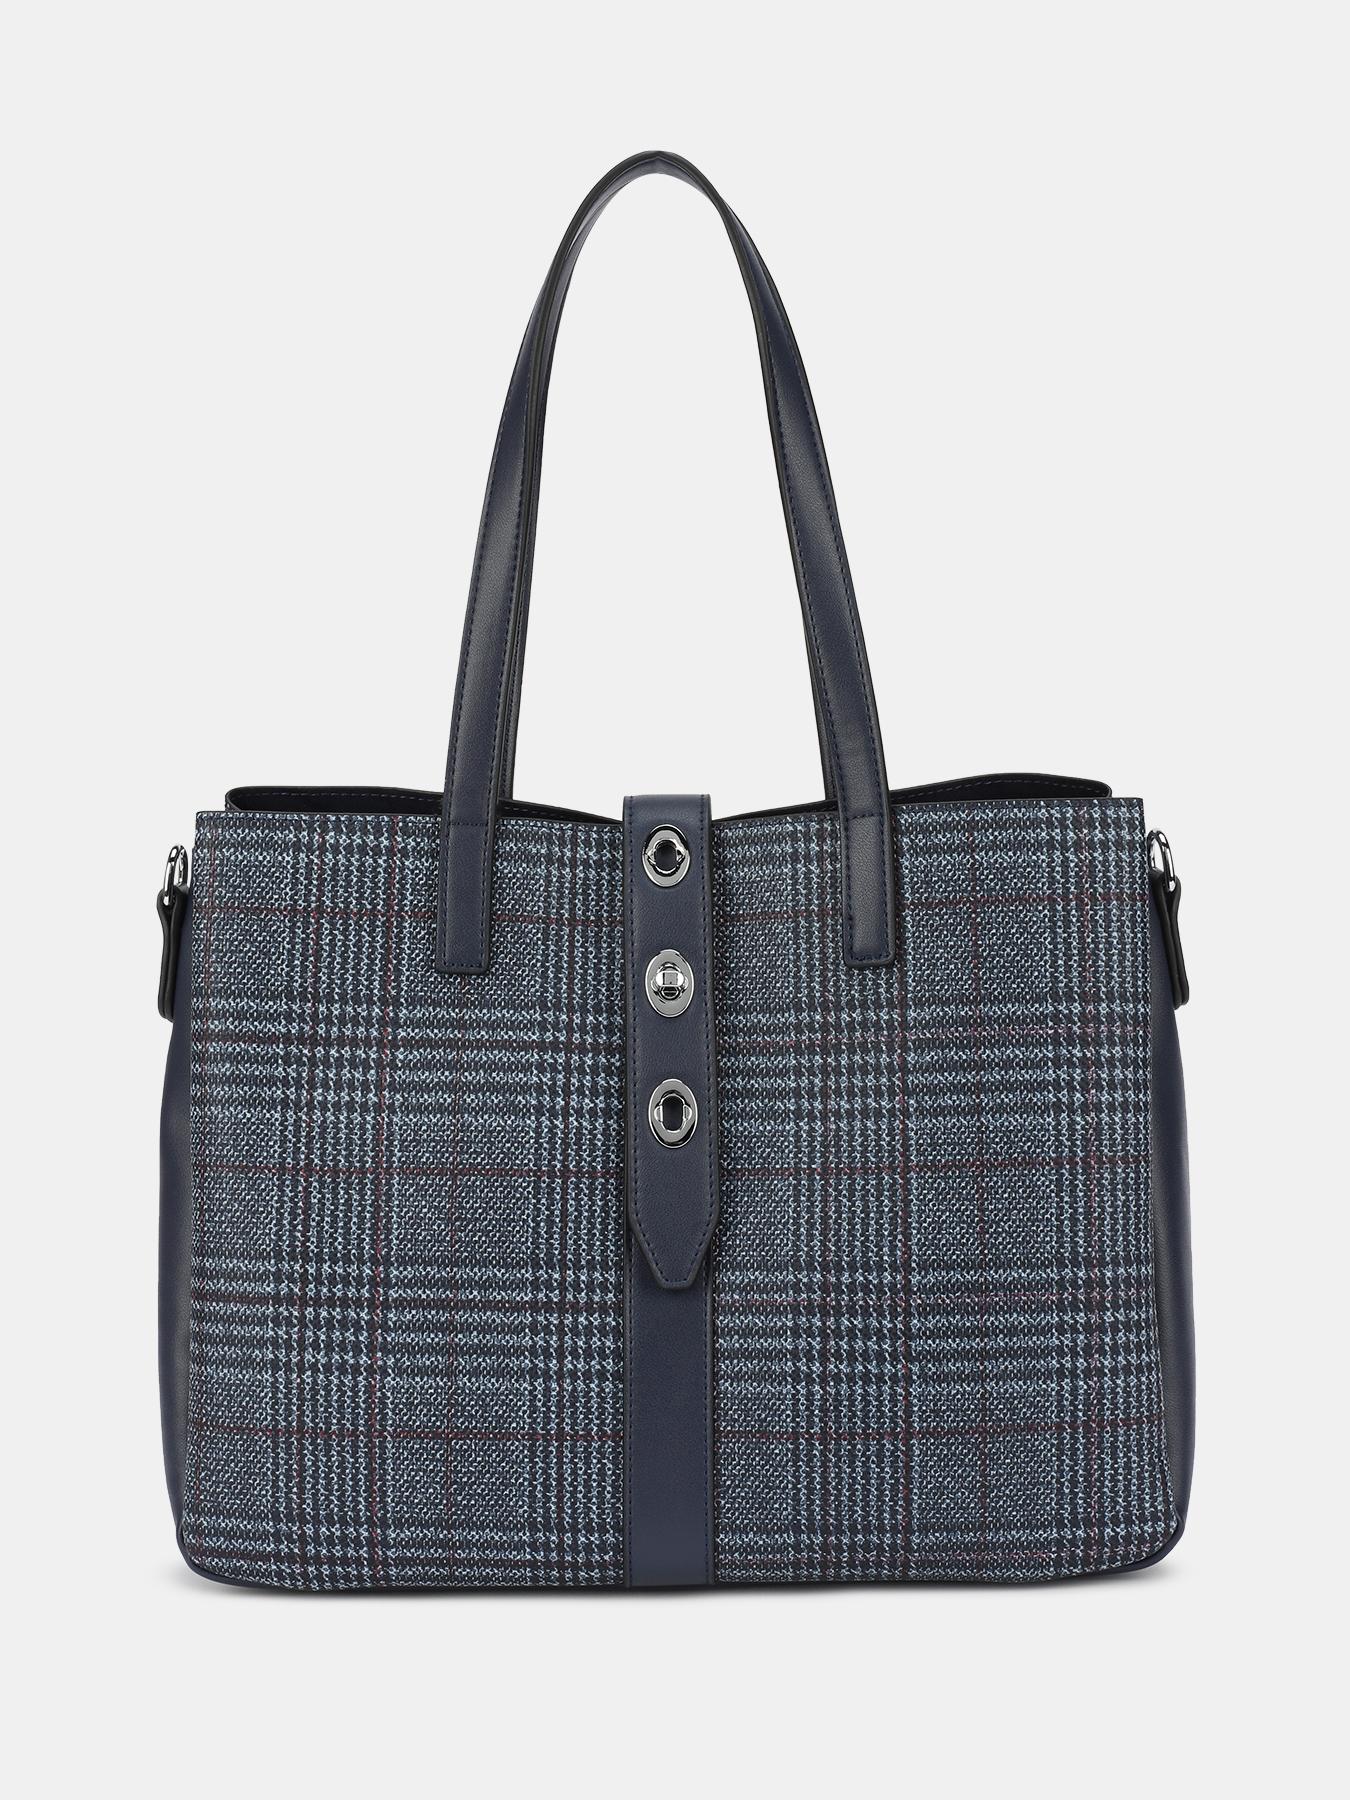 Фото - Сумки ORSA Женская сумка женская сумка grey 24645554